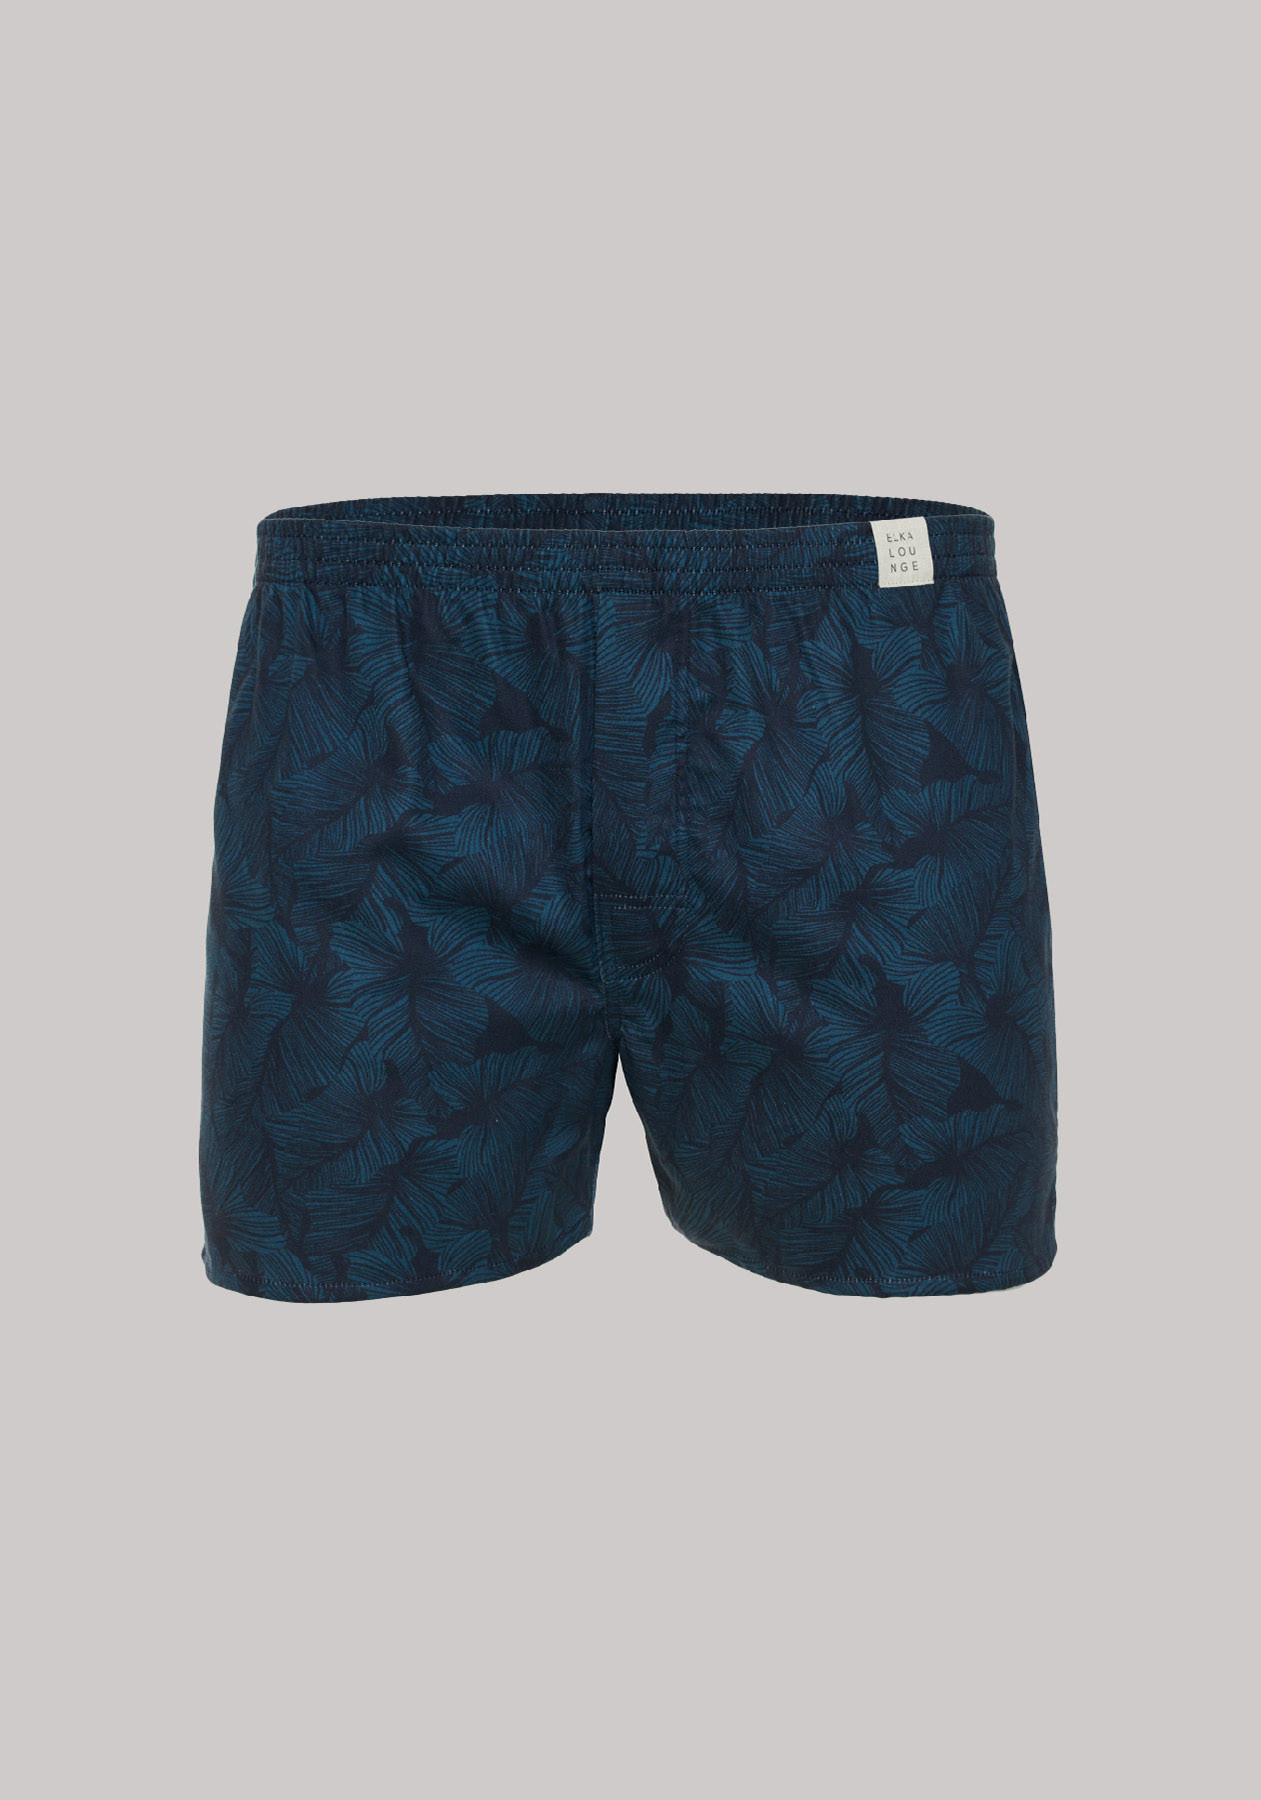 Men boxershorts Blue leaves